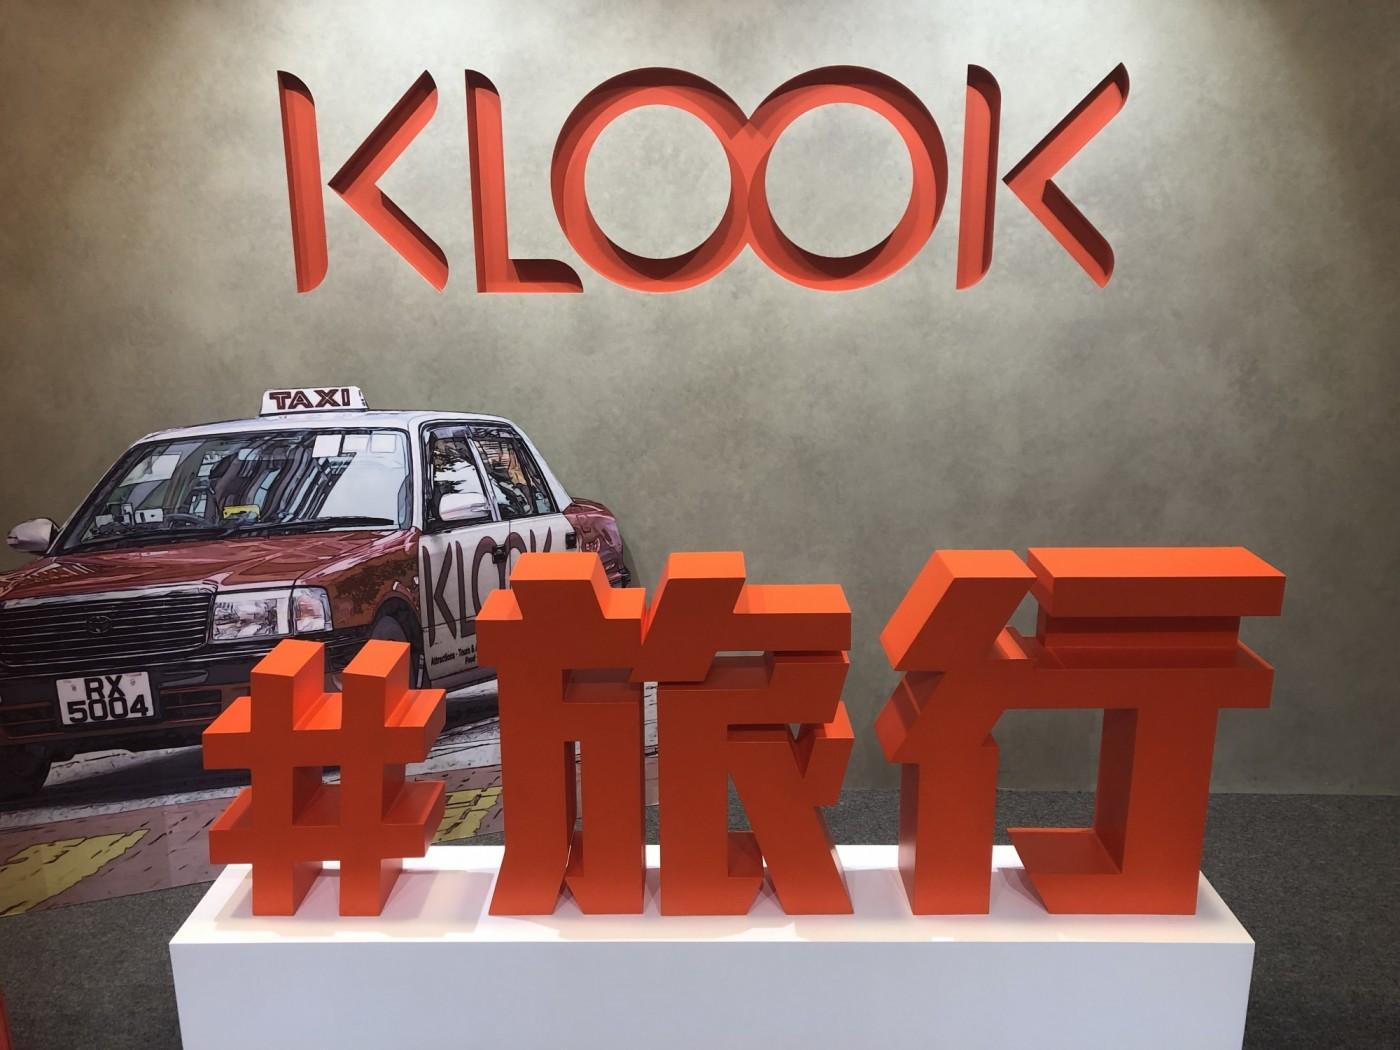 Klook強化體驗旅遊,預告《冰與火之歌》行程即將上線